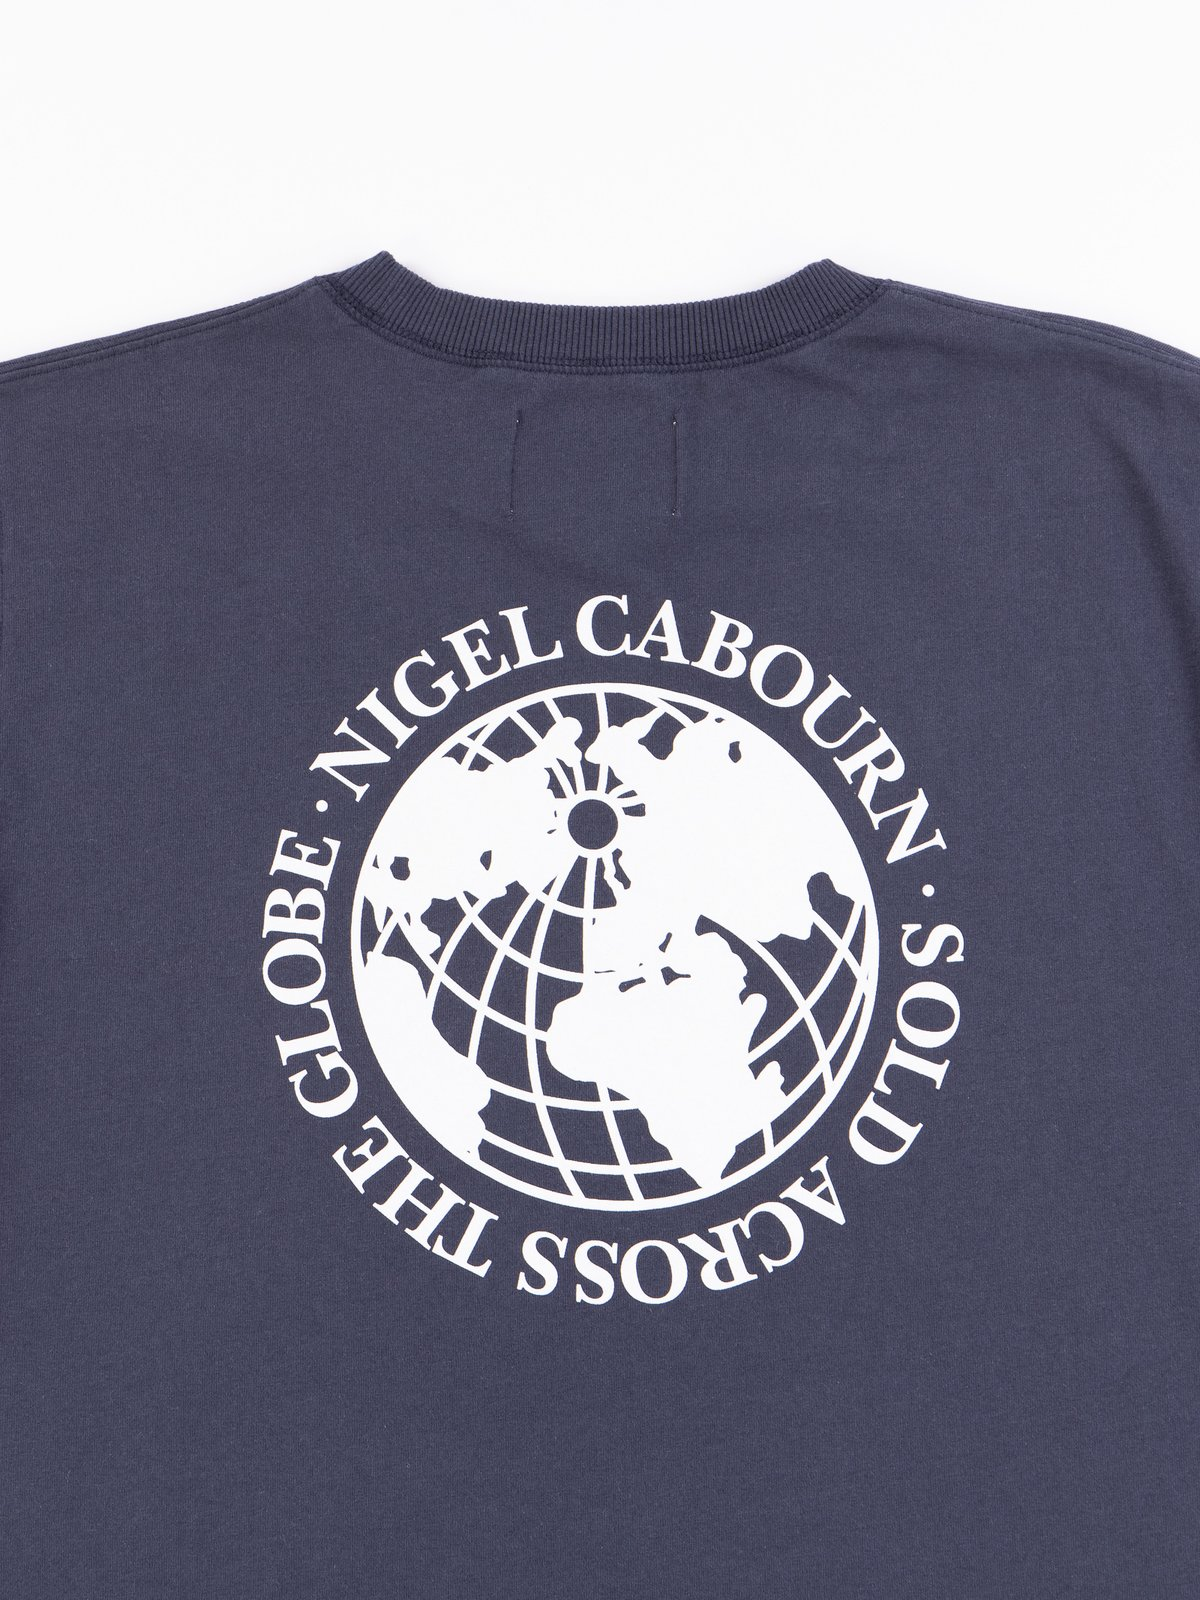 Navy Globe Back Print Tee - Image 5